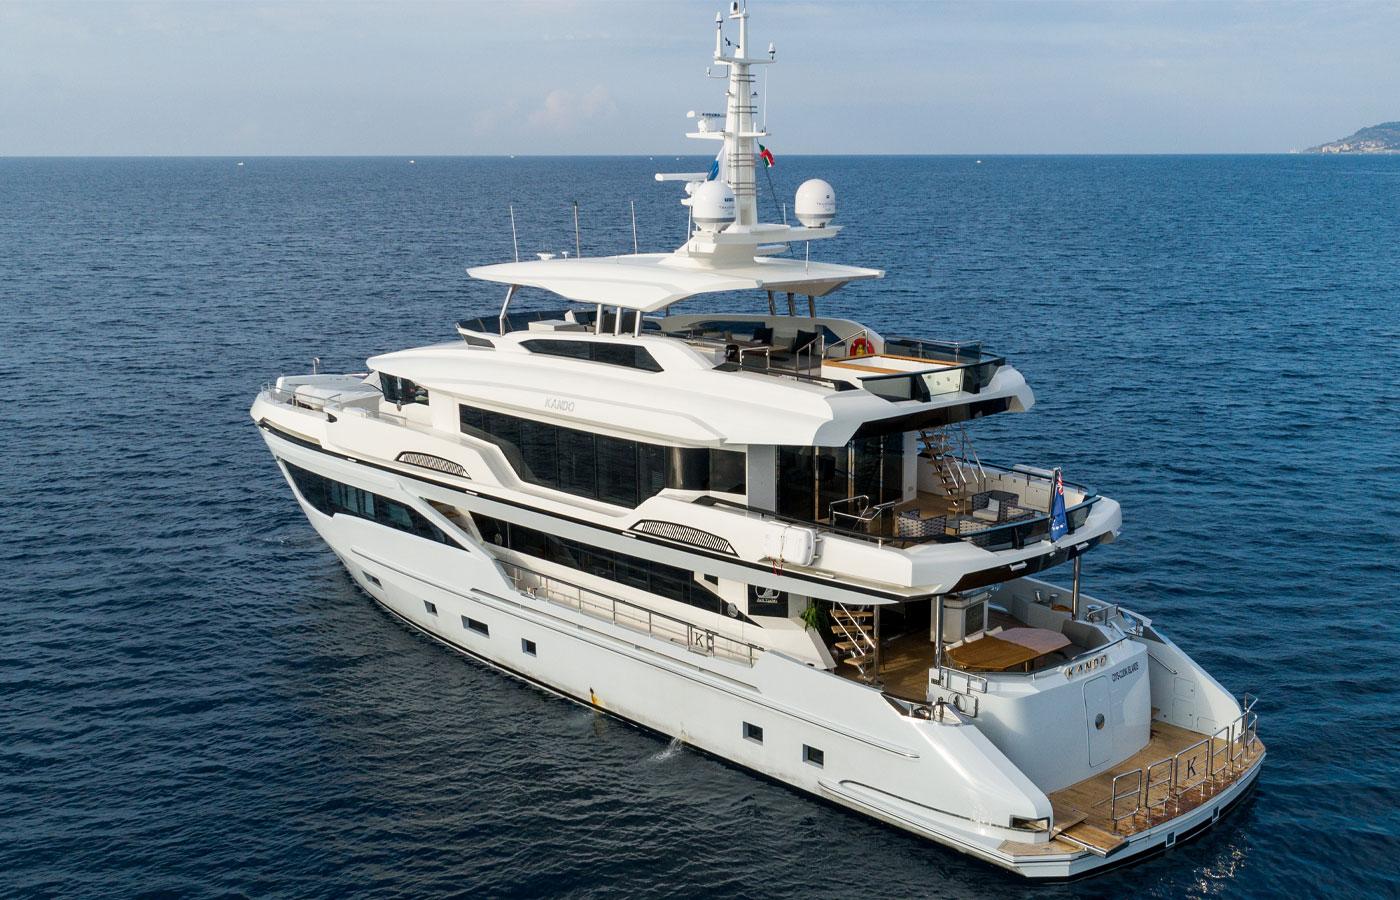 Kando 110 Explorer Debuts at Cannes [Yacht Highlight]